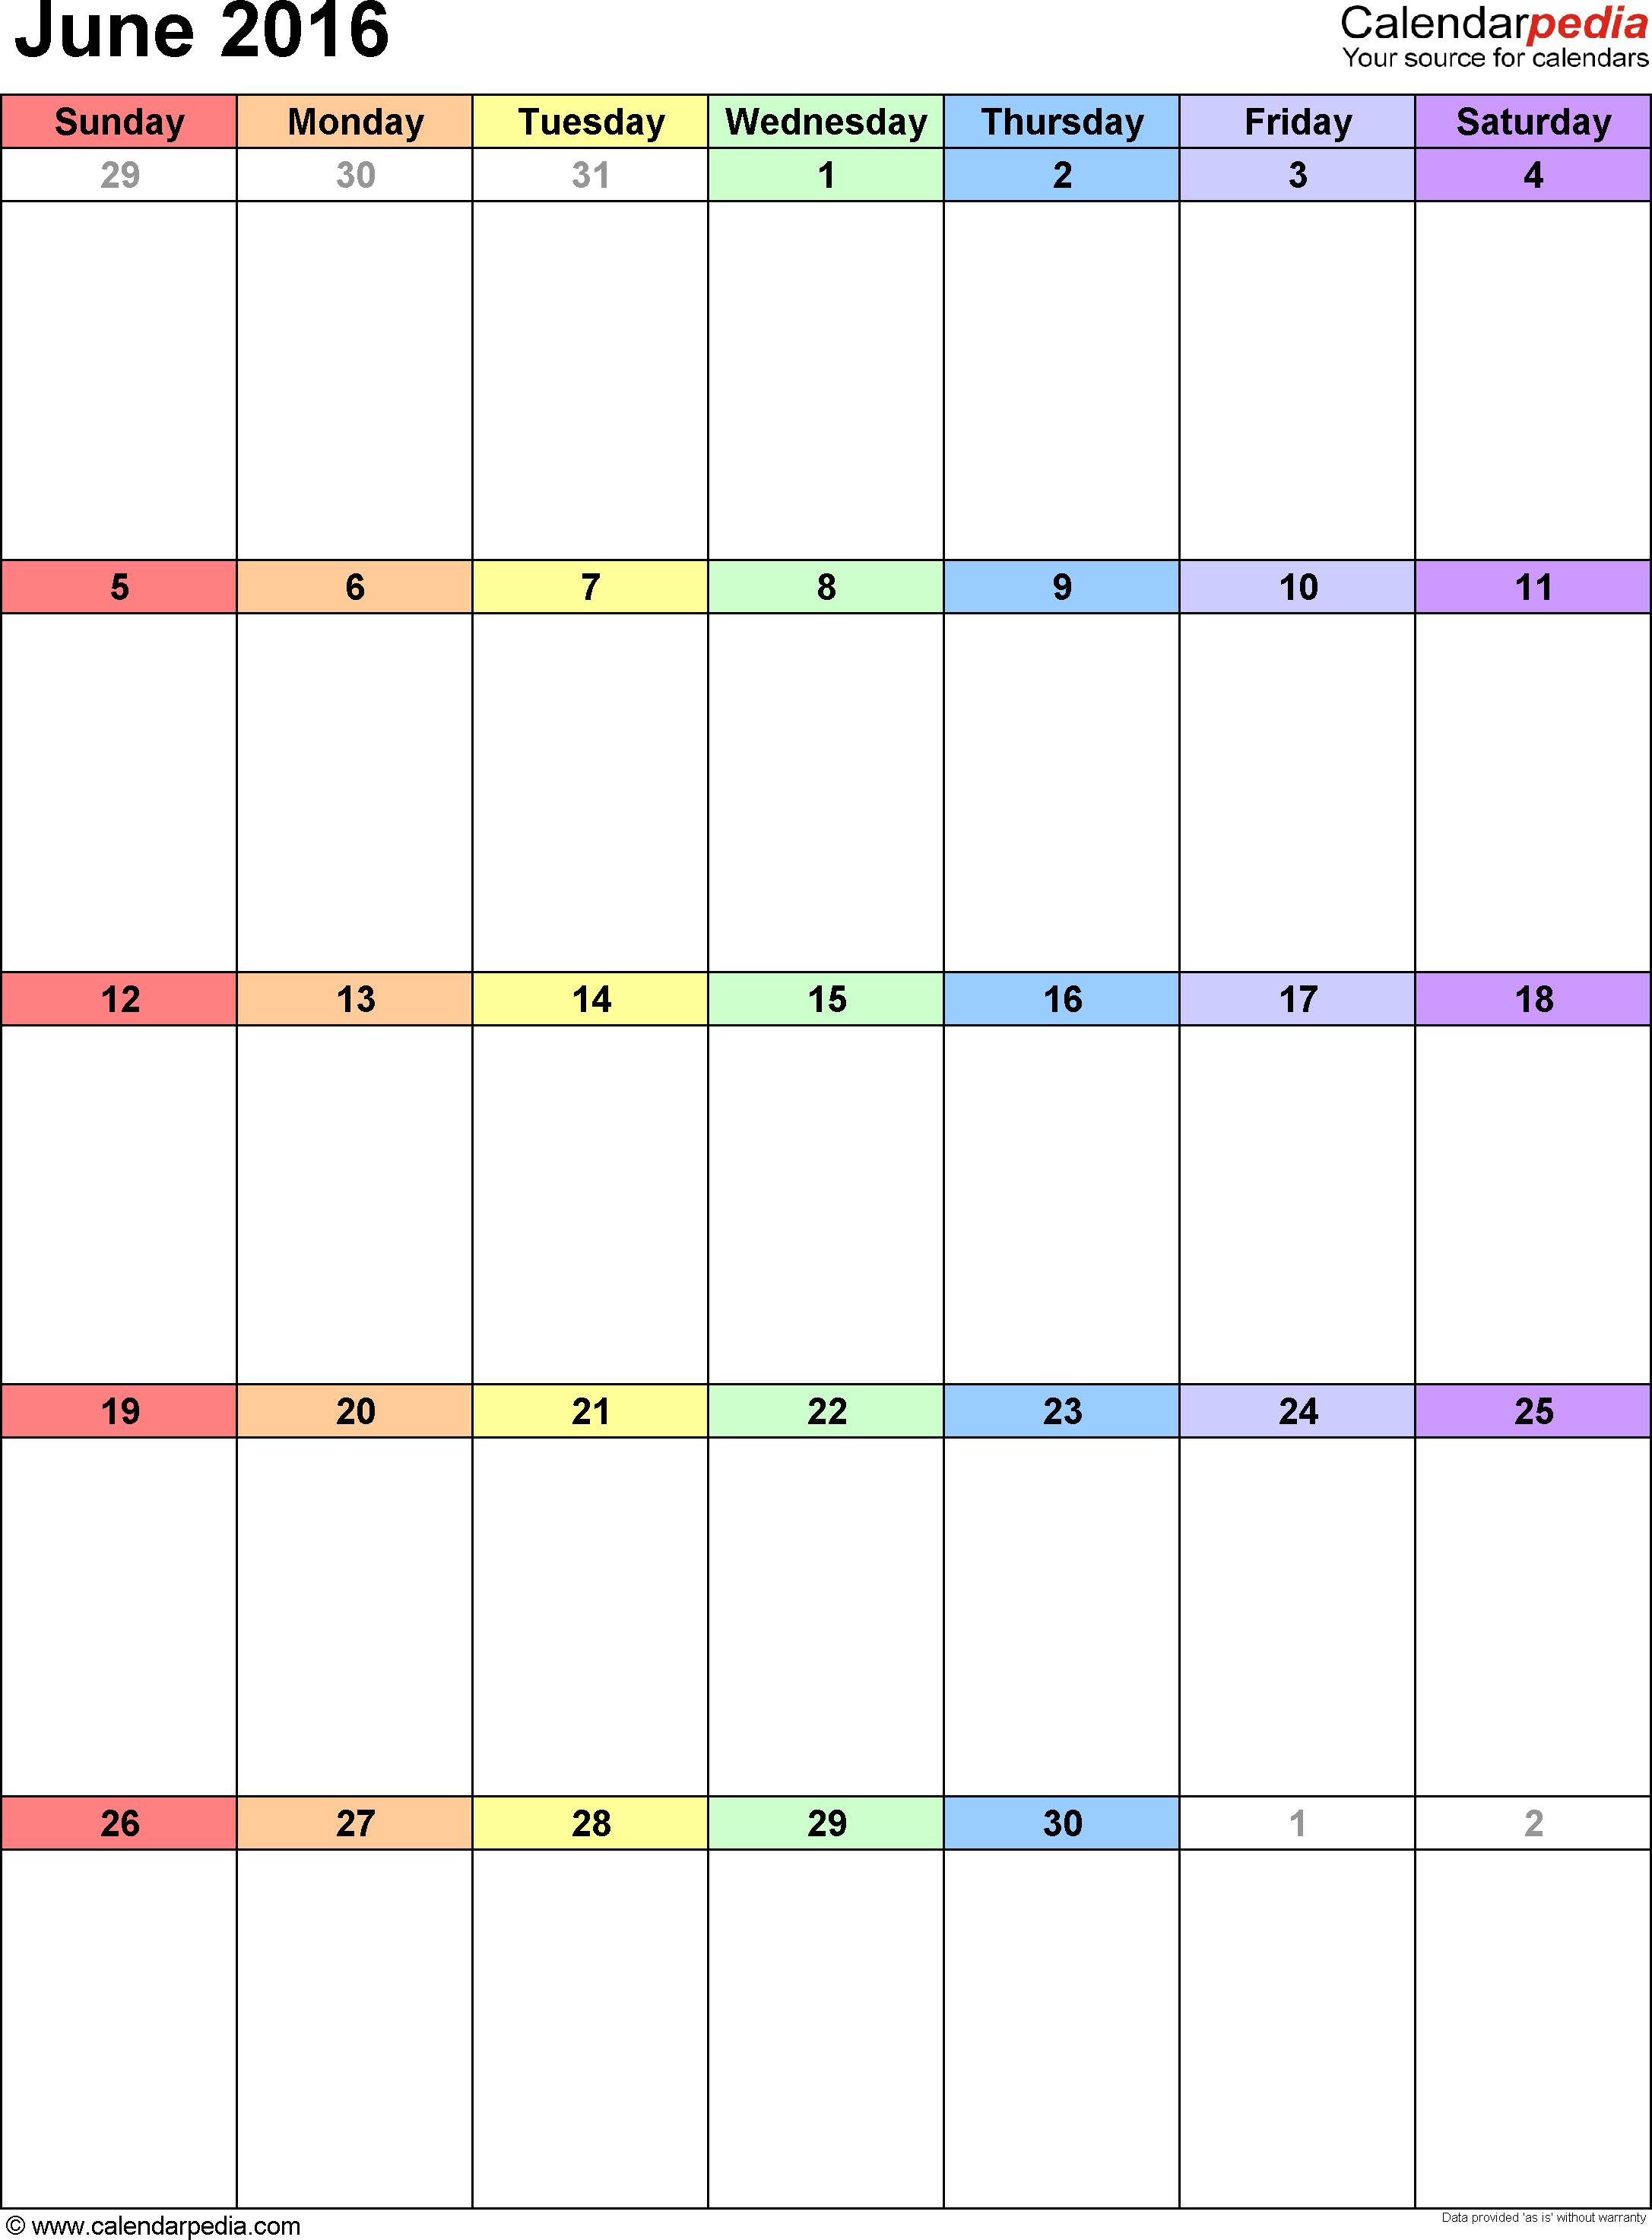 June 2016 Calendars for Word, Excel & PDF